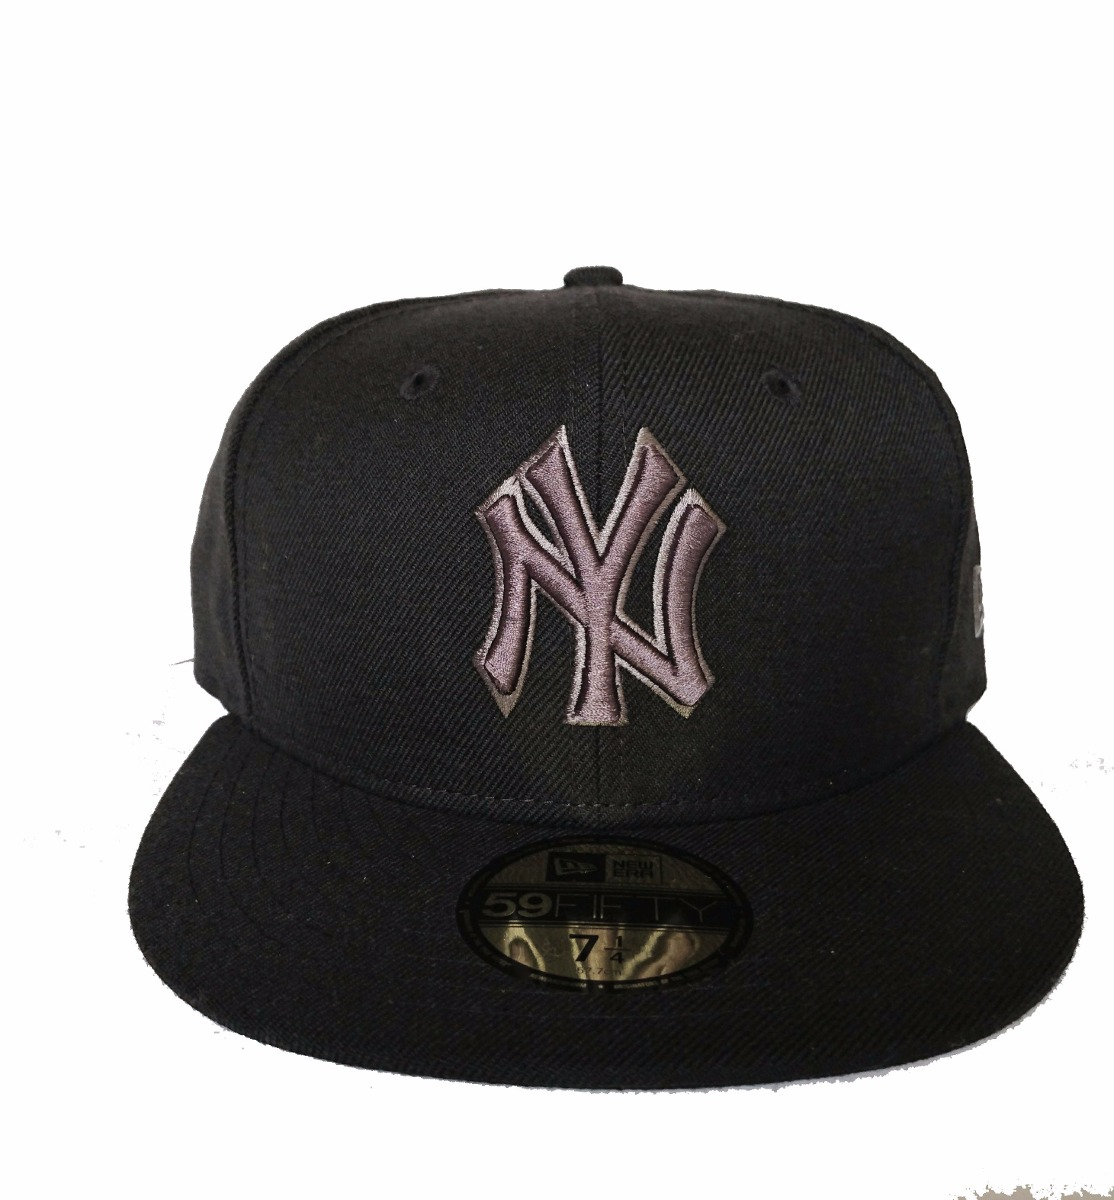 Gorra Yankees Oficial Mlb Negro Gris 7 1 4 -   900.00 en Mercado Libre 6171c6c347b